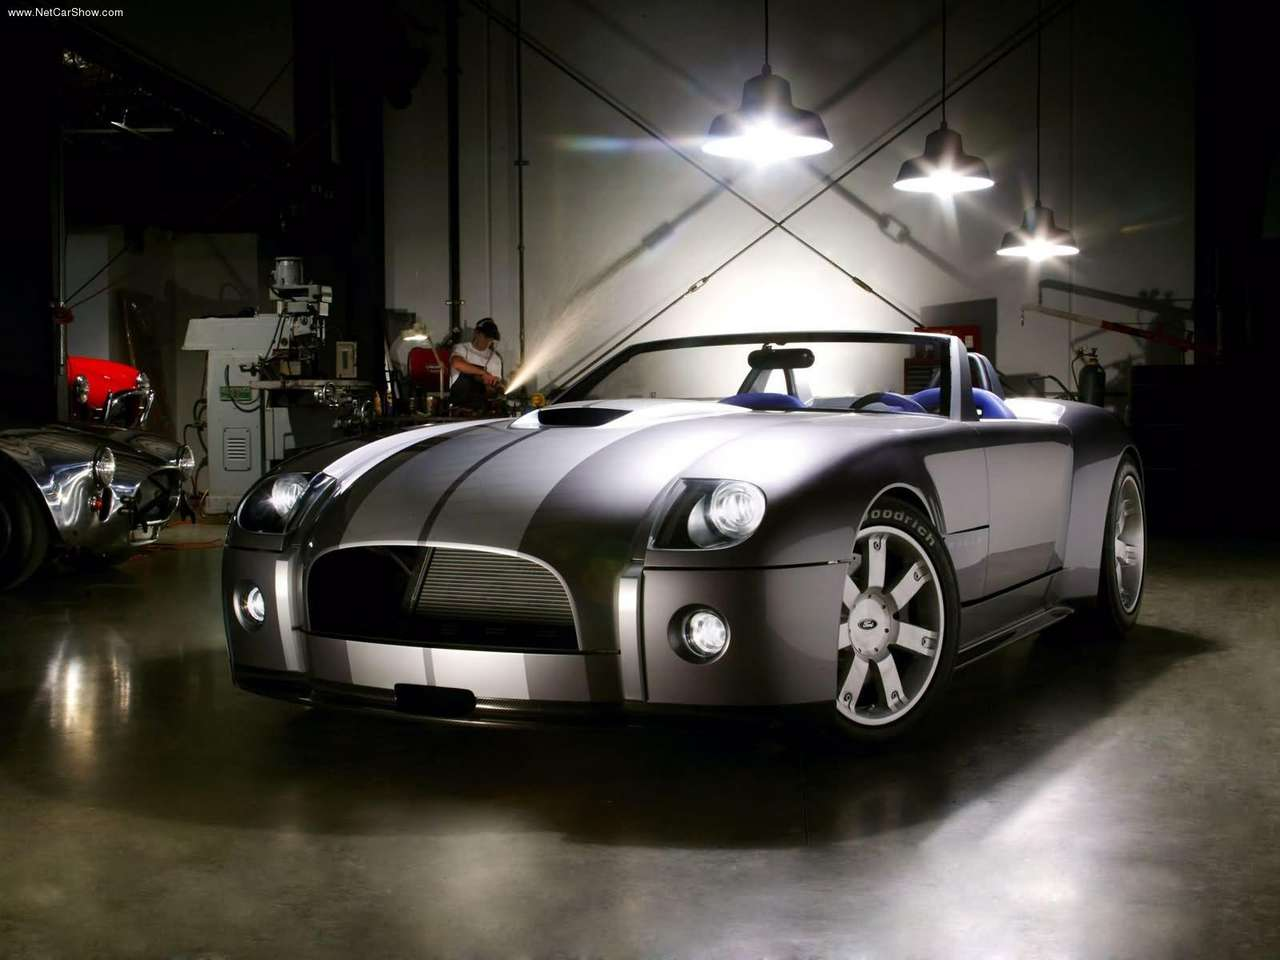 http://3.bp.blogspot.com/-xviwksh7aTk/TZaz15f7fGI/AAAAAAAAHFY/drhOUp9o32c/s1600/Ford-Shelby_Cobra_Concept_2004_1280x960_wallpaper_01.jpg